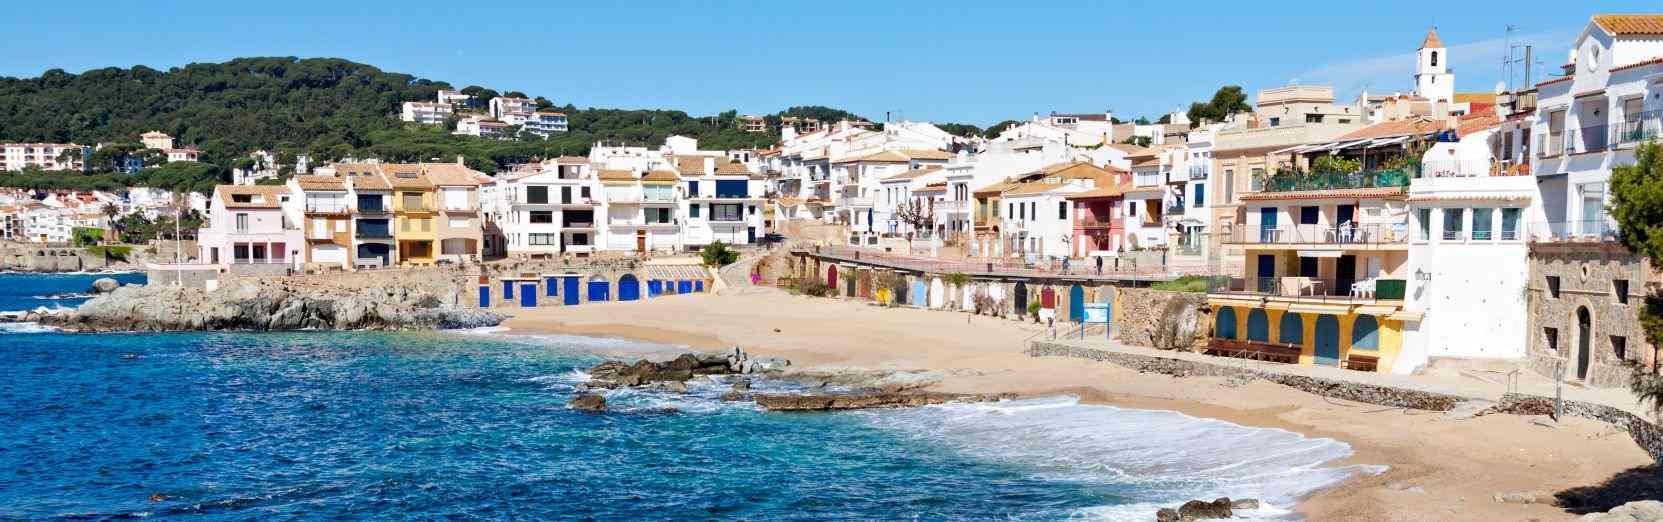 Spanien Urlaub günstig